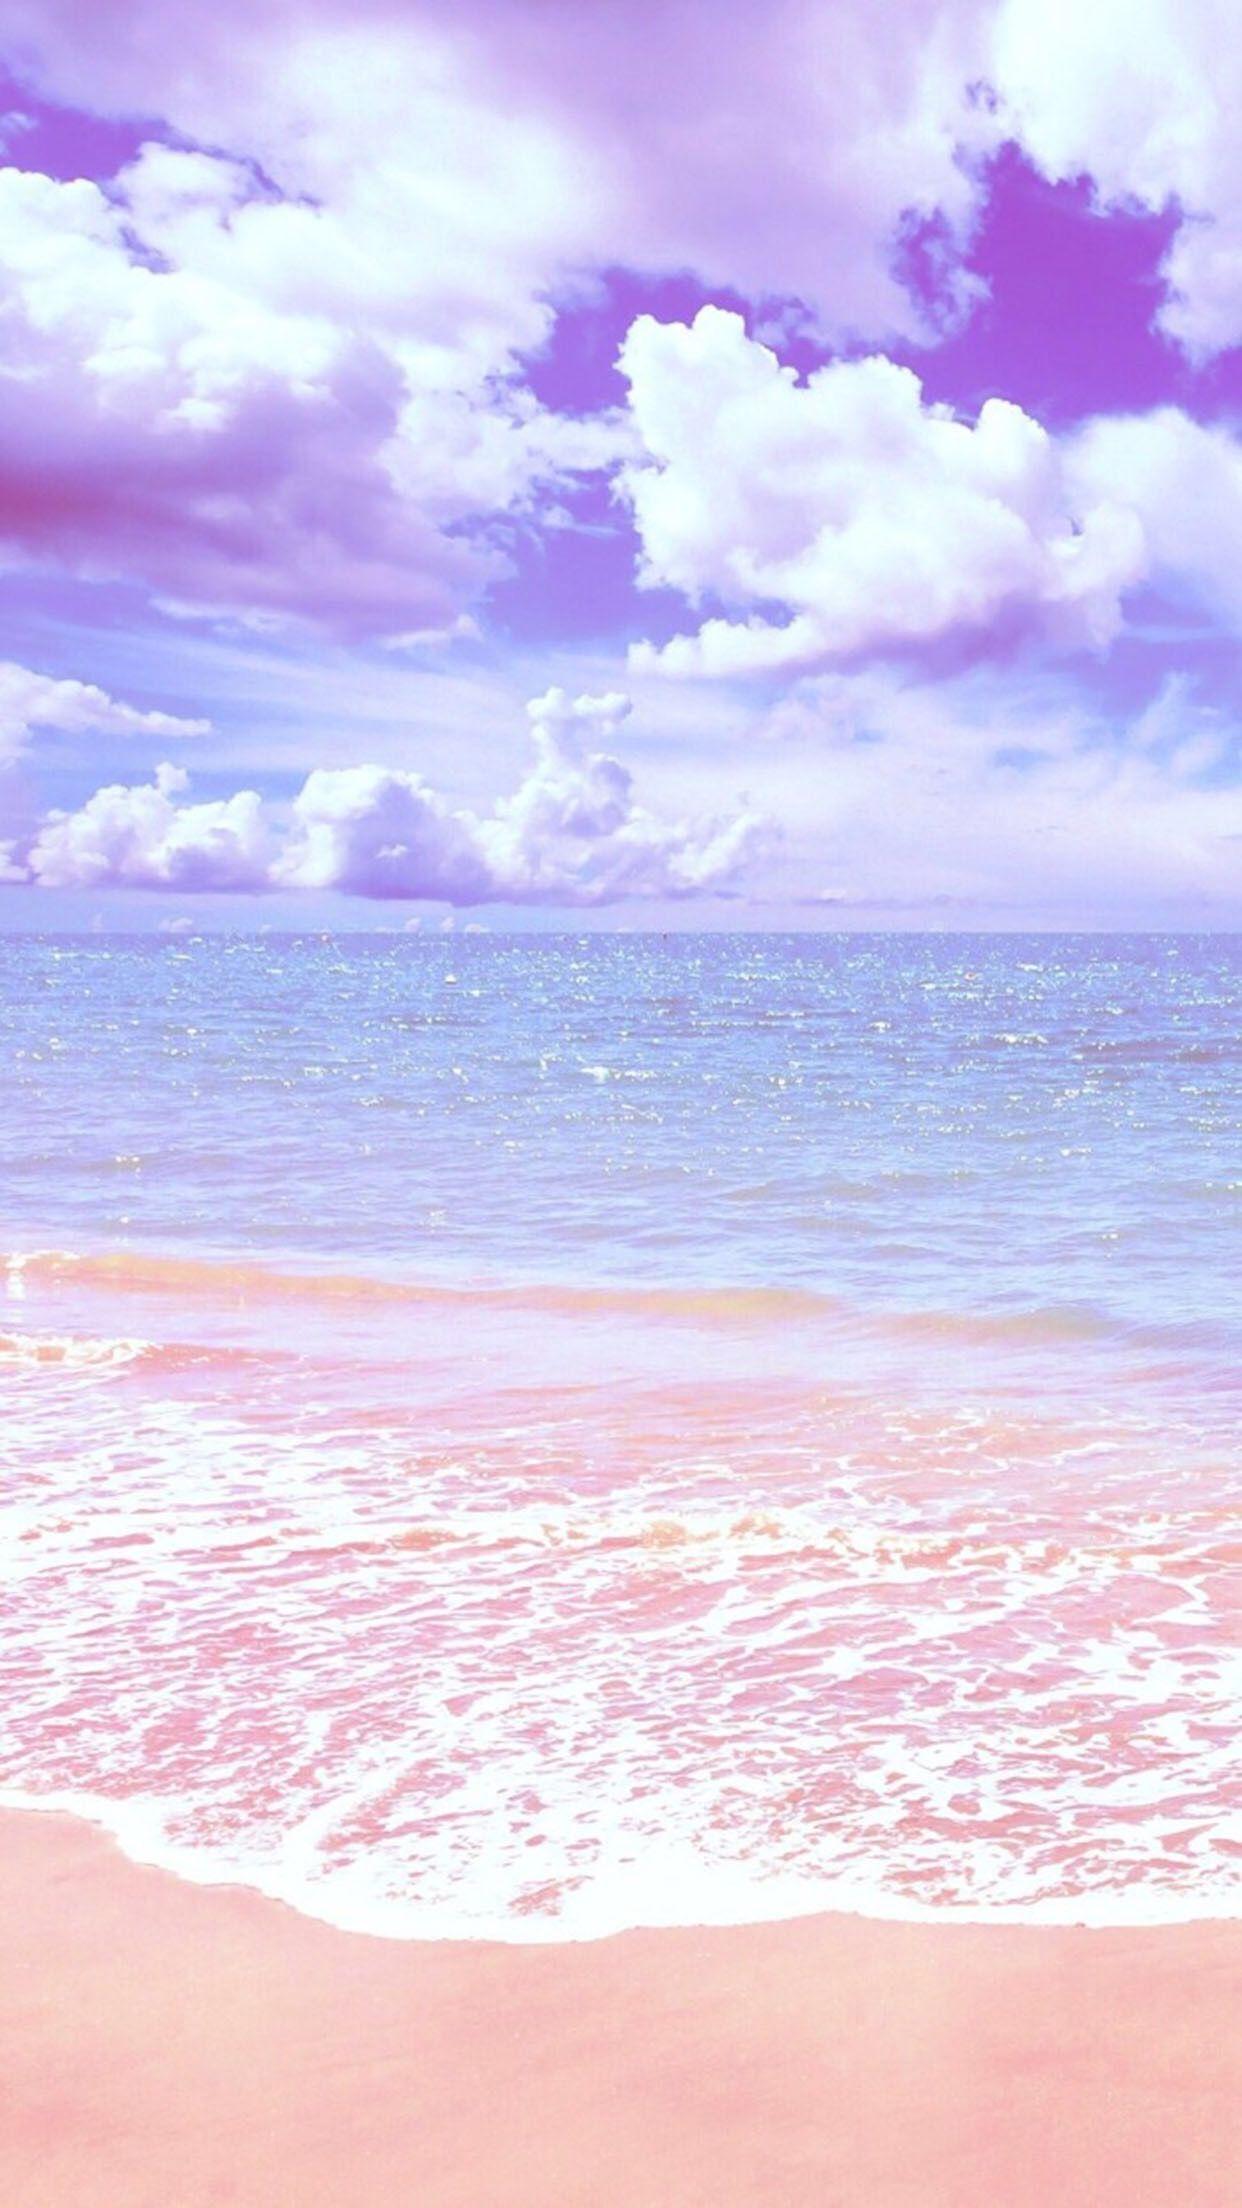 Pink Seas Beautiful Nature Wallpaper Pastel Background Wallpapers Aesthetic Pastel Wallpaper